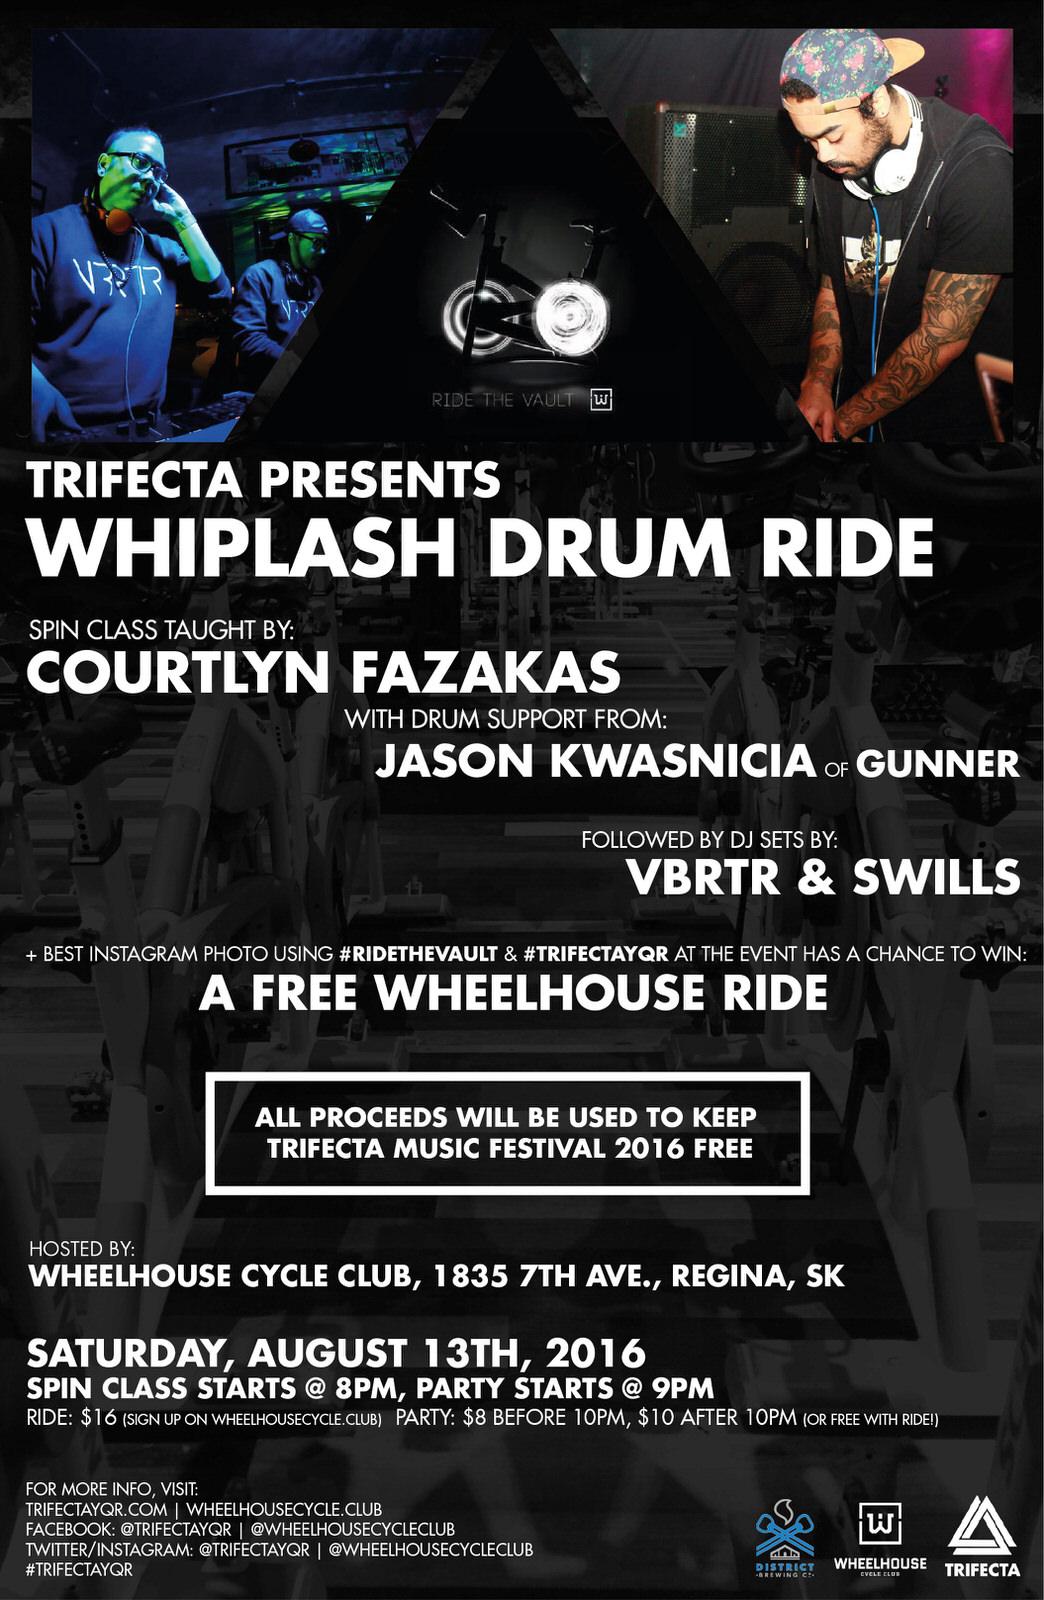 Trifecta x Wheelhouse 2016 Poster-01.jpg